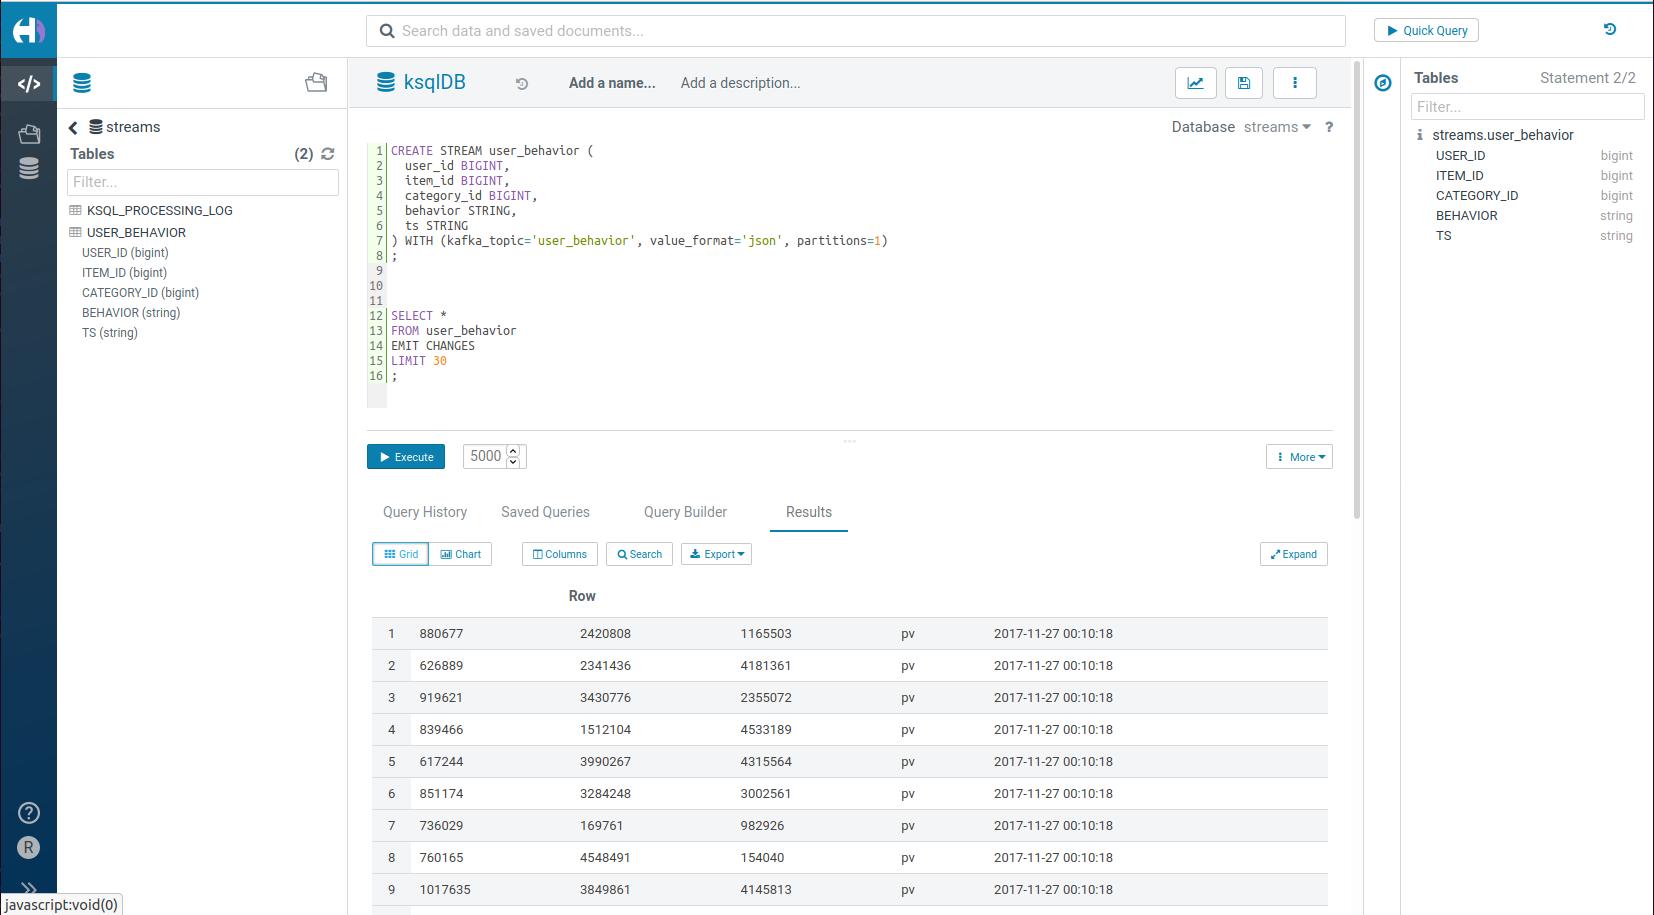 Stream SQL Editor